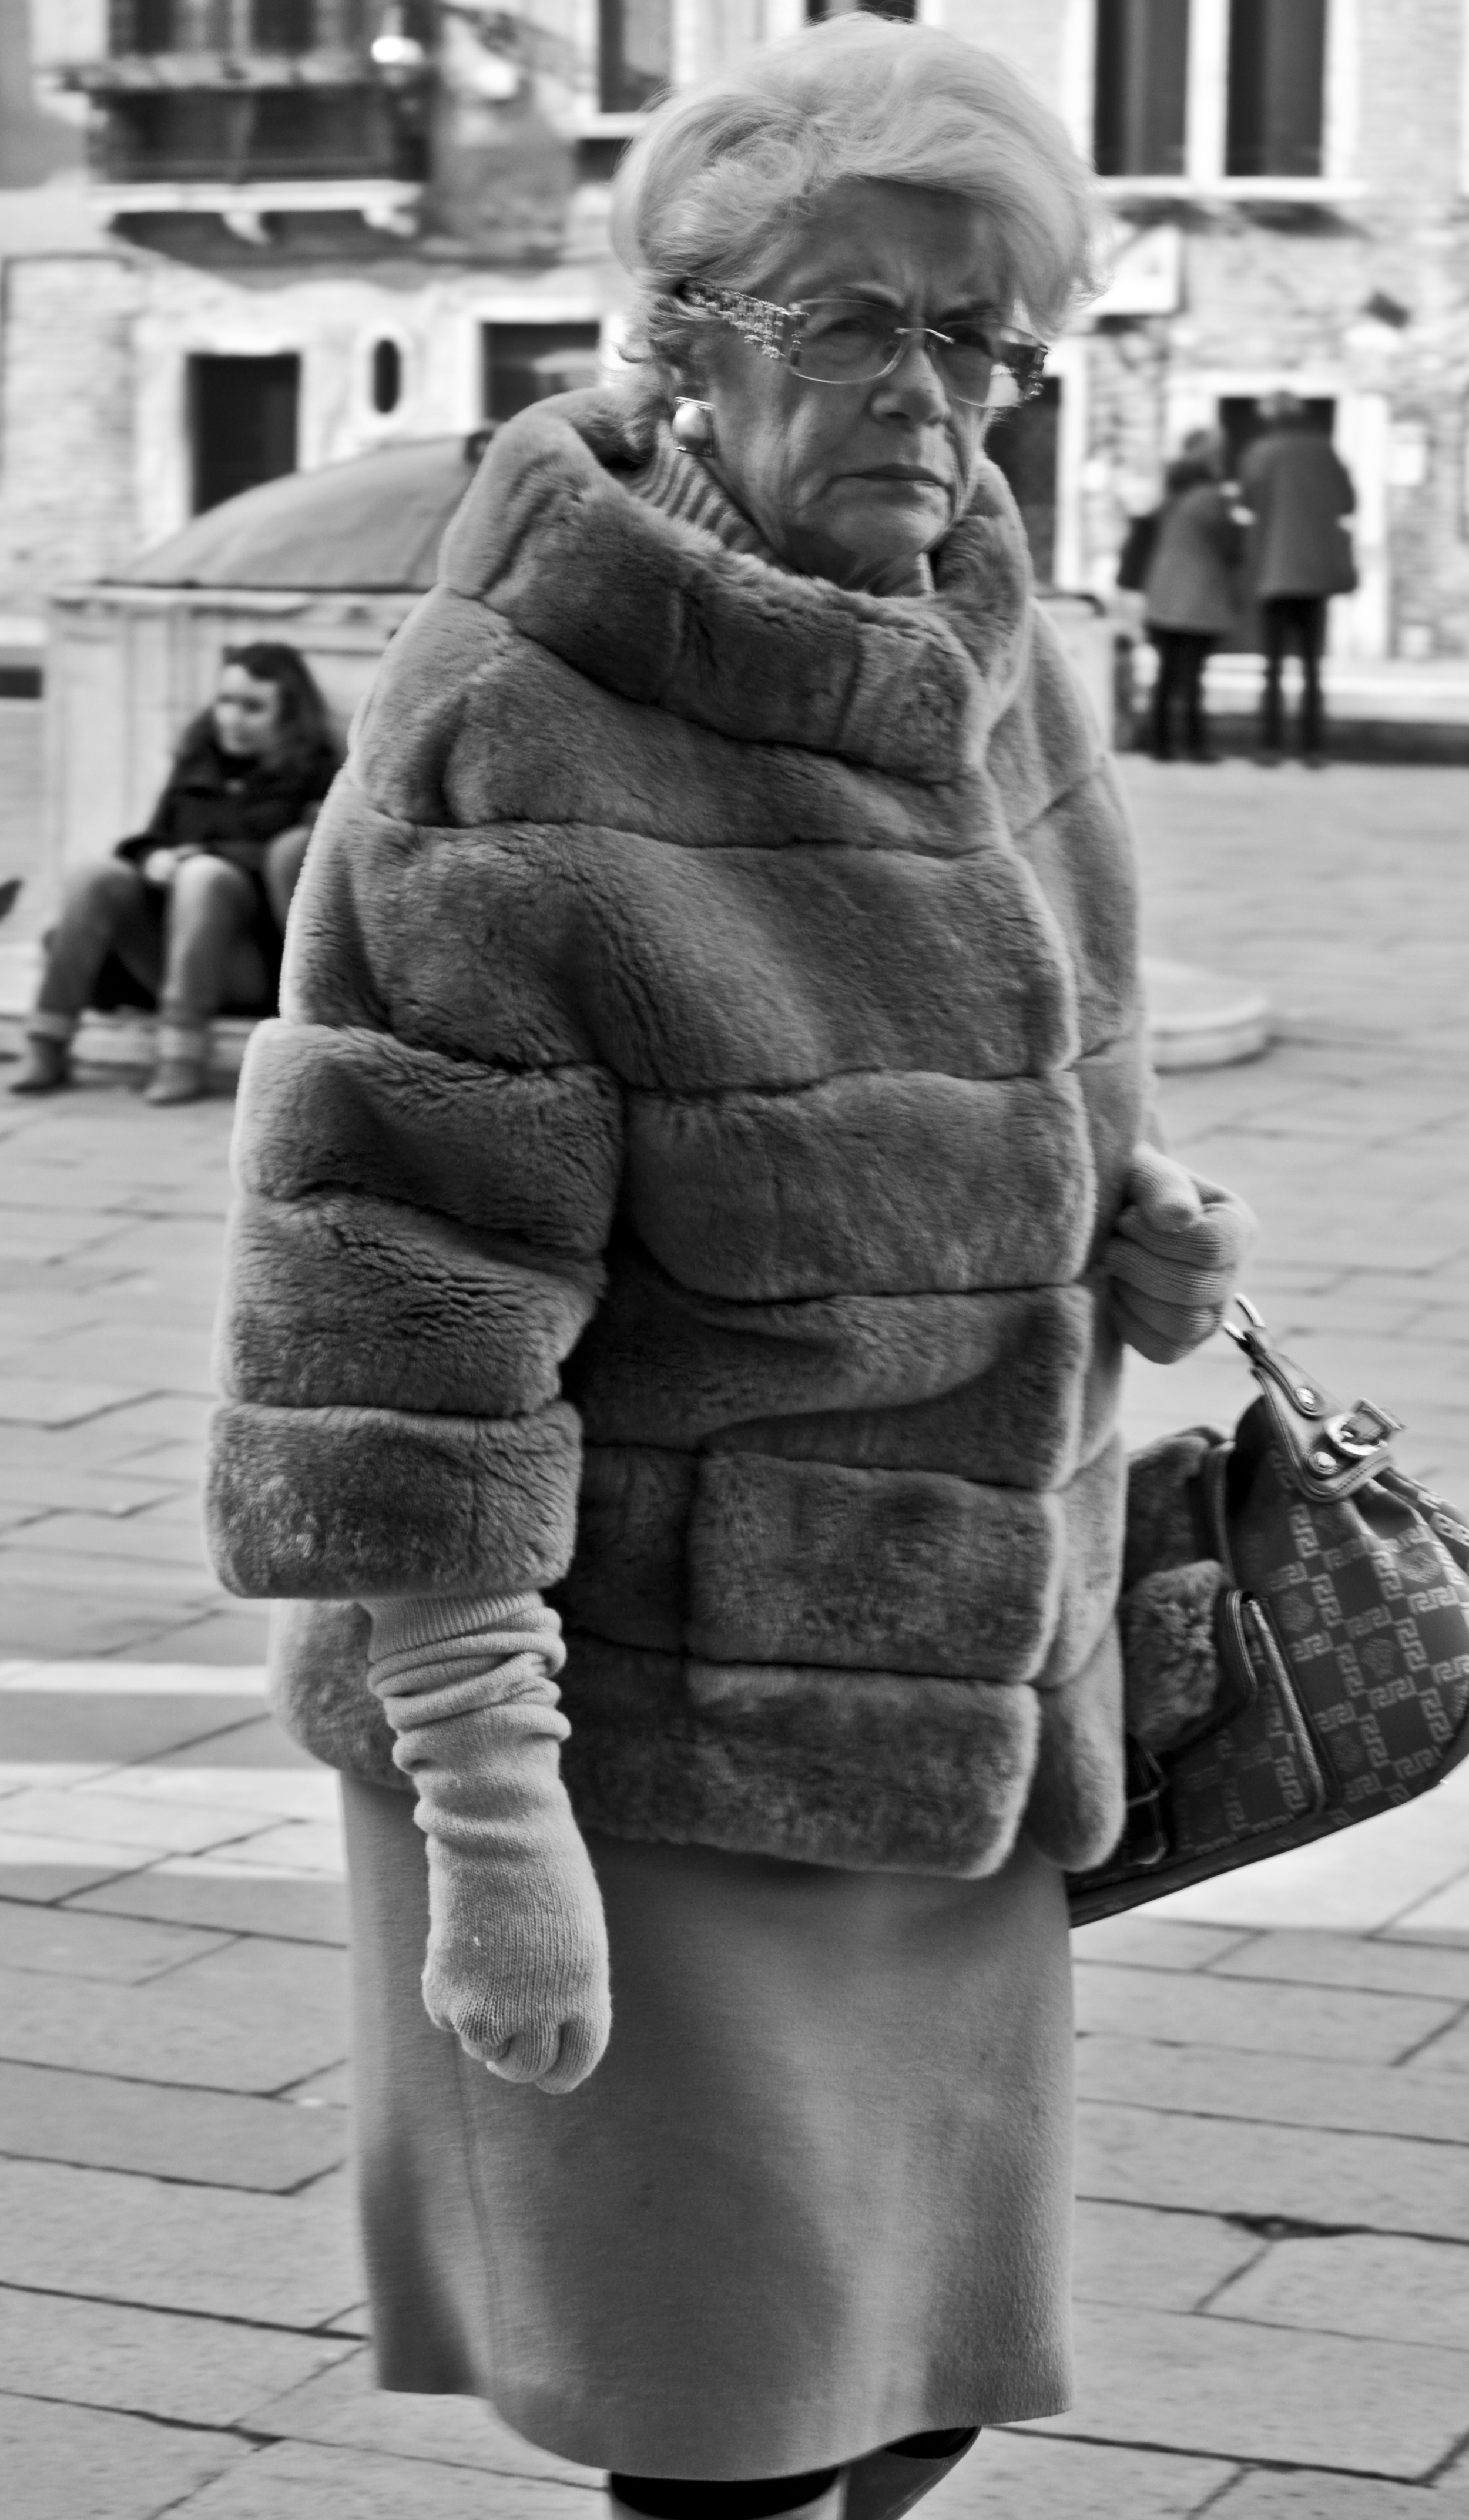 classy mean lady BW.jpg